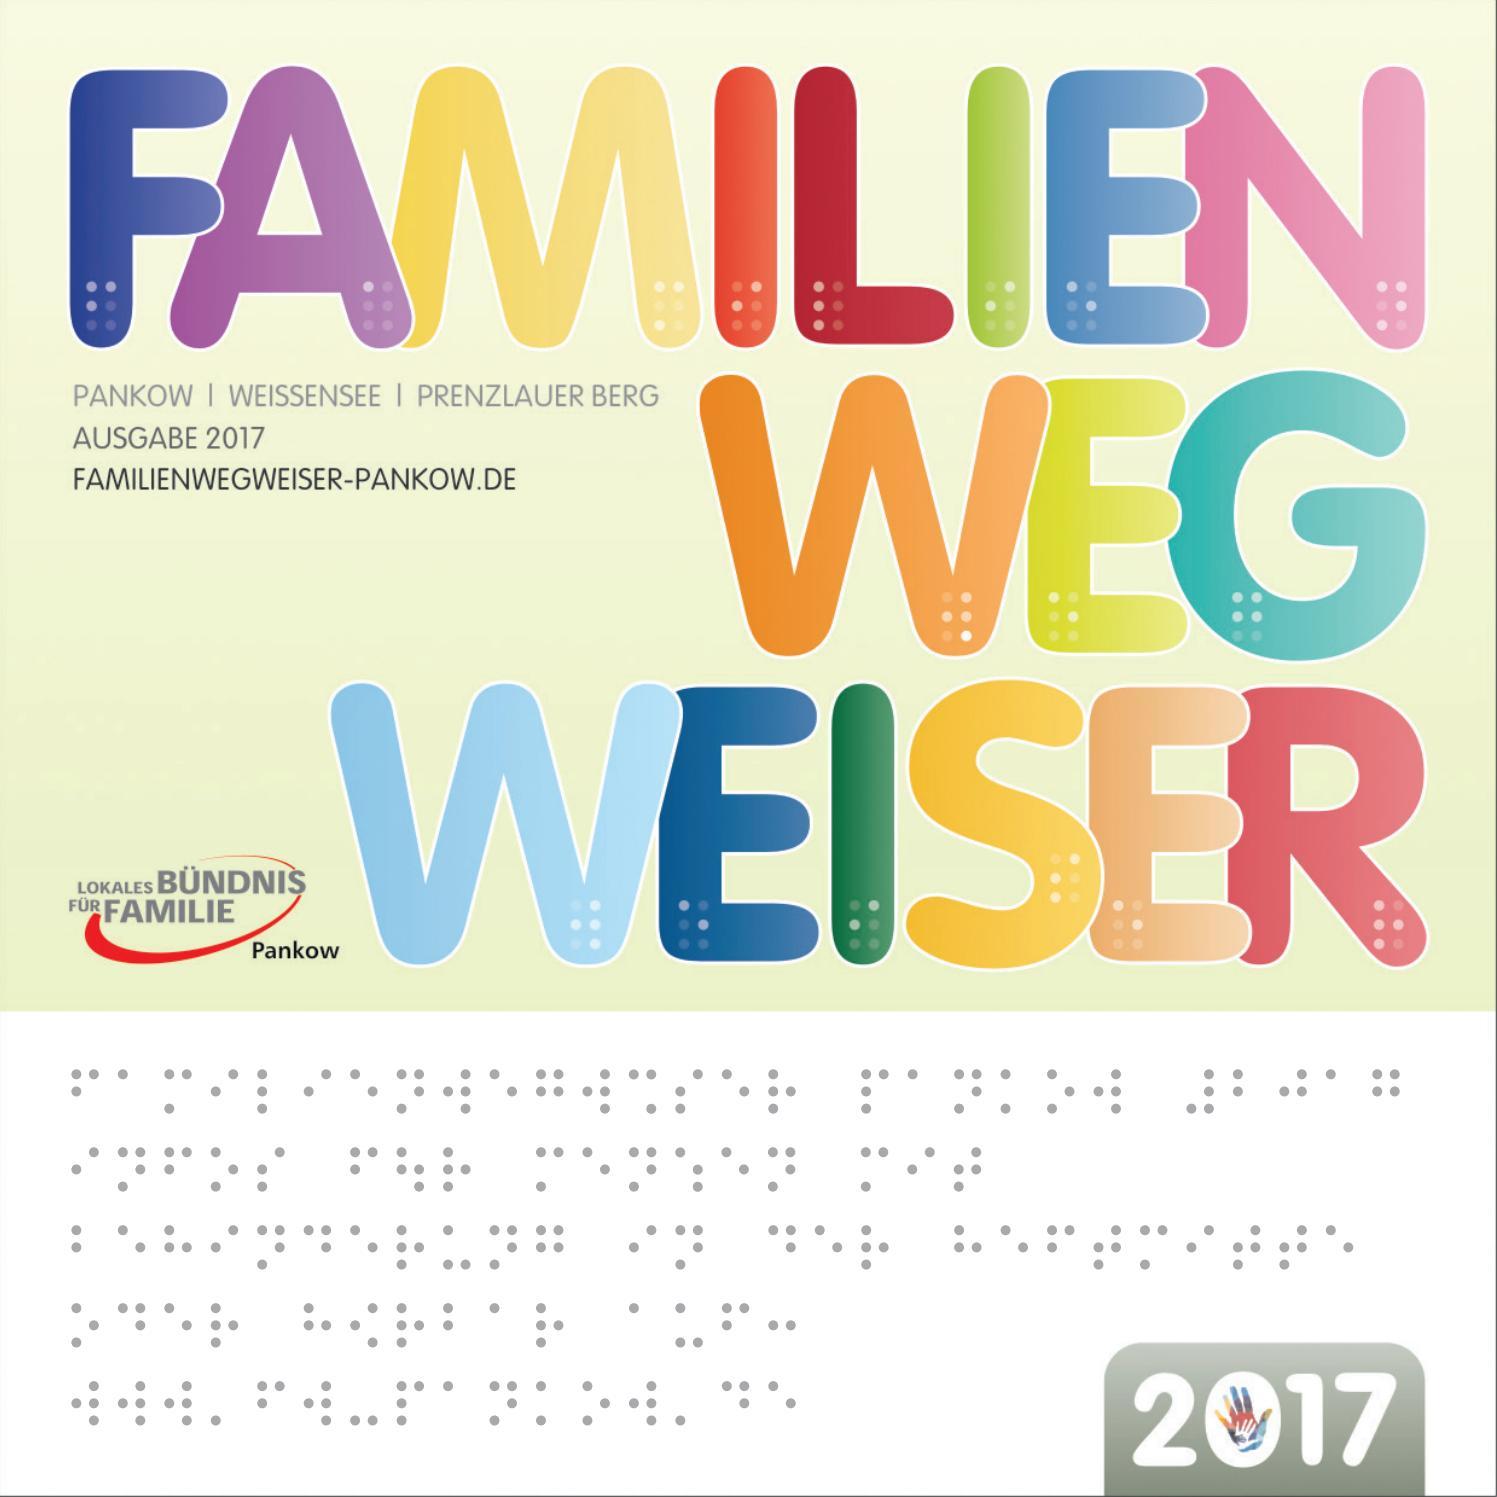 Familienwegweiser 2017 by IN TOUCH BERLIN LOKALMARKETING - issuu